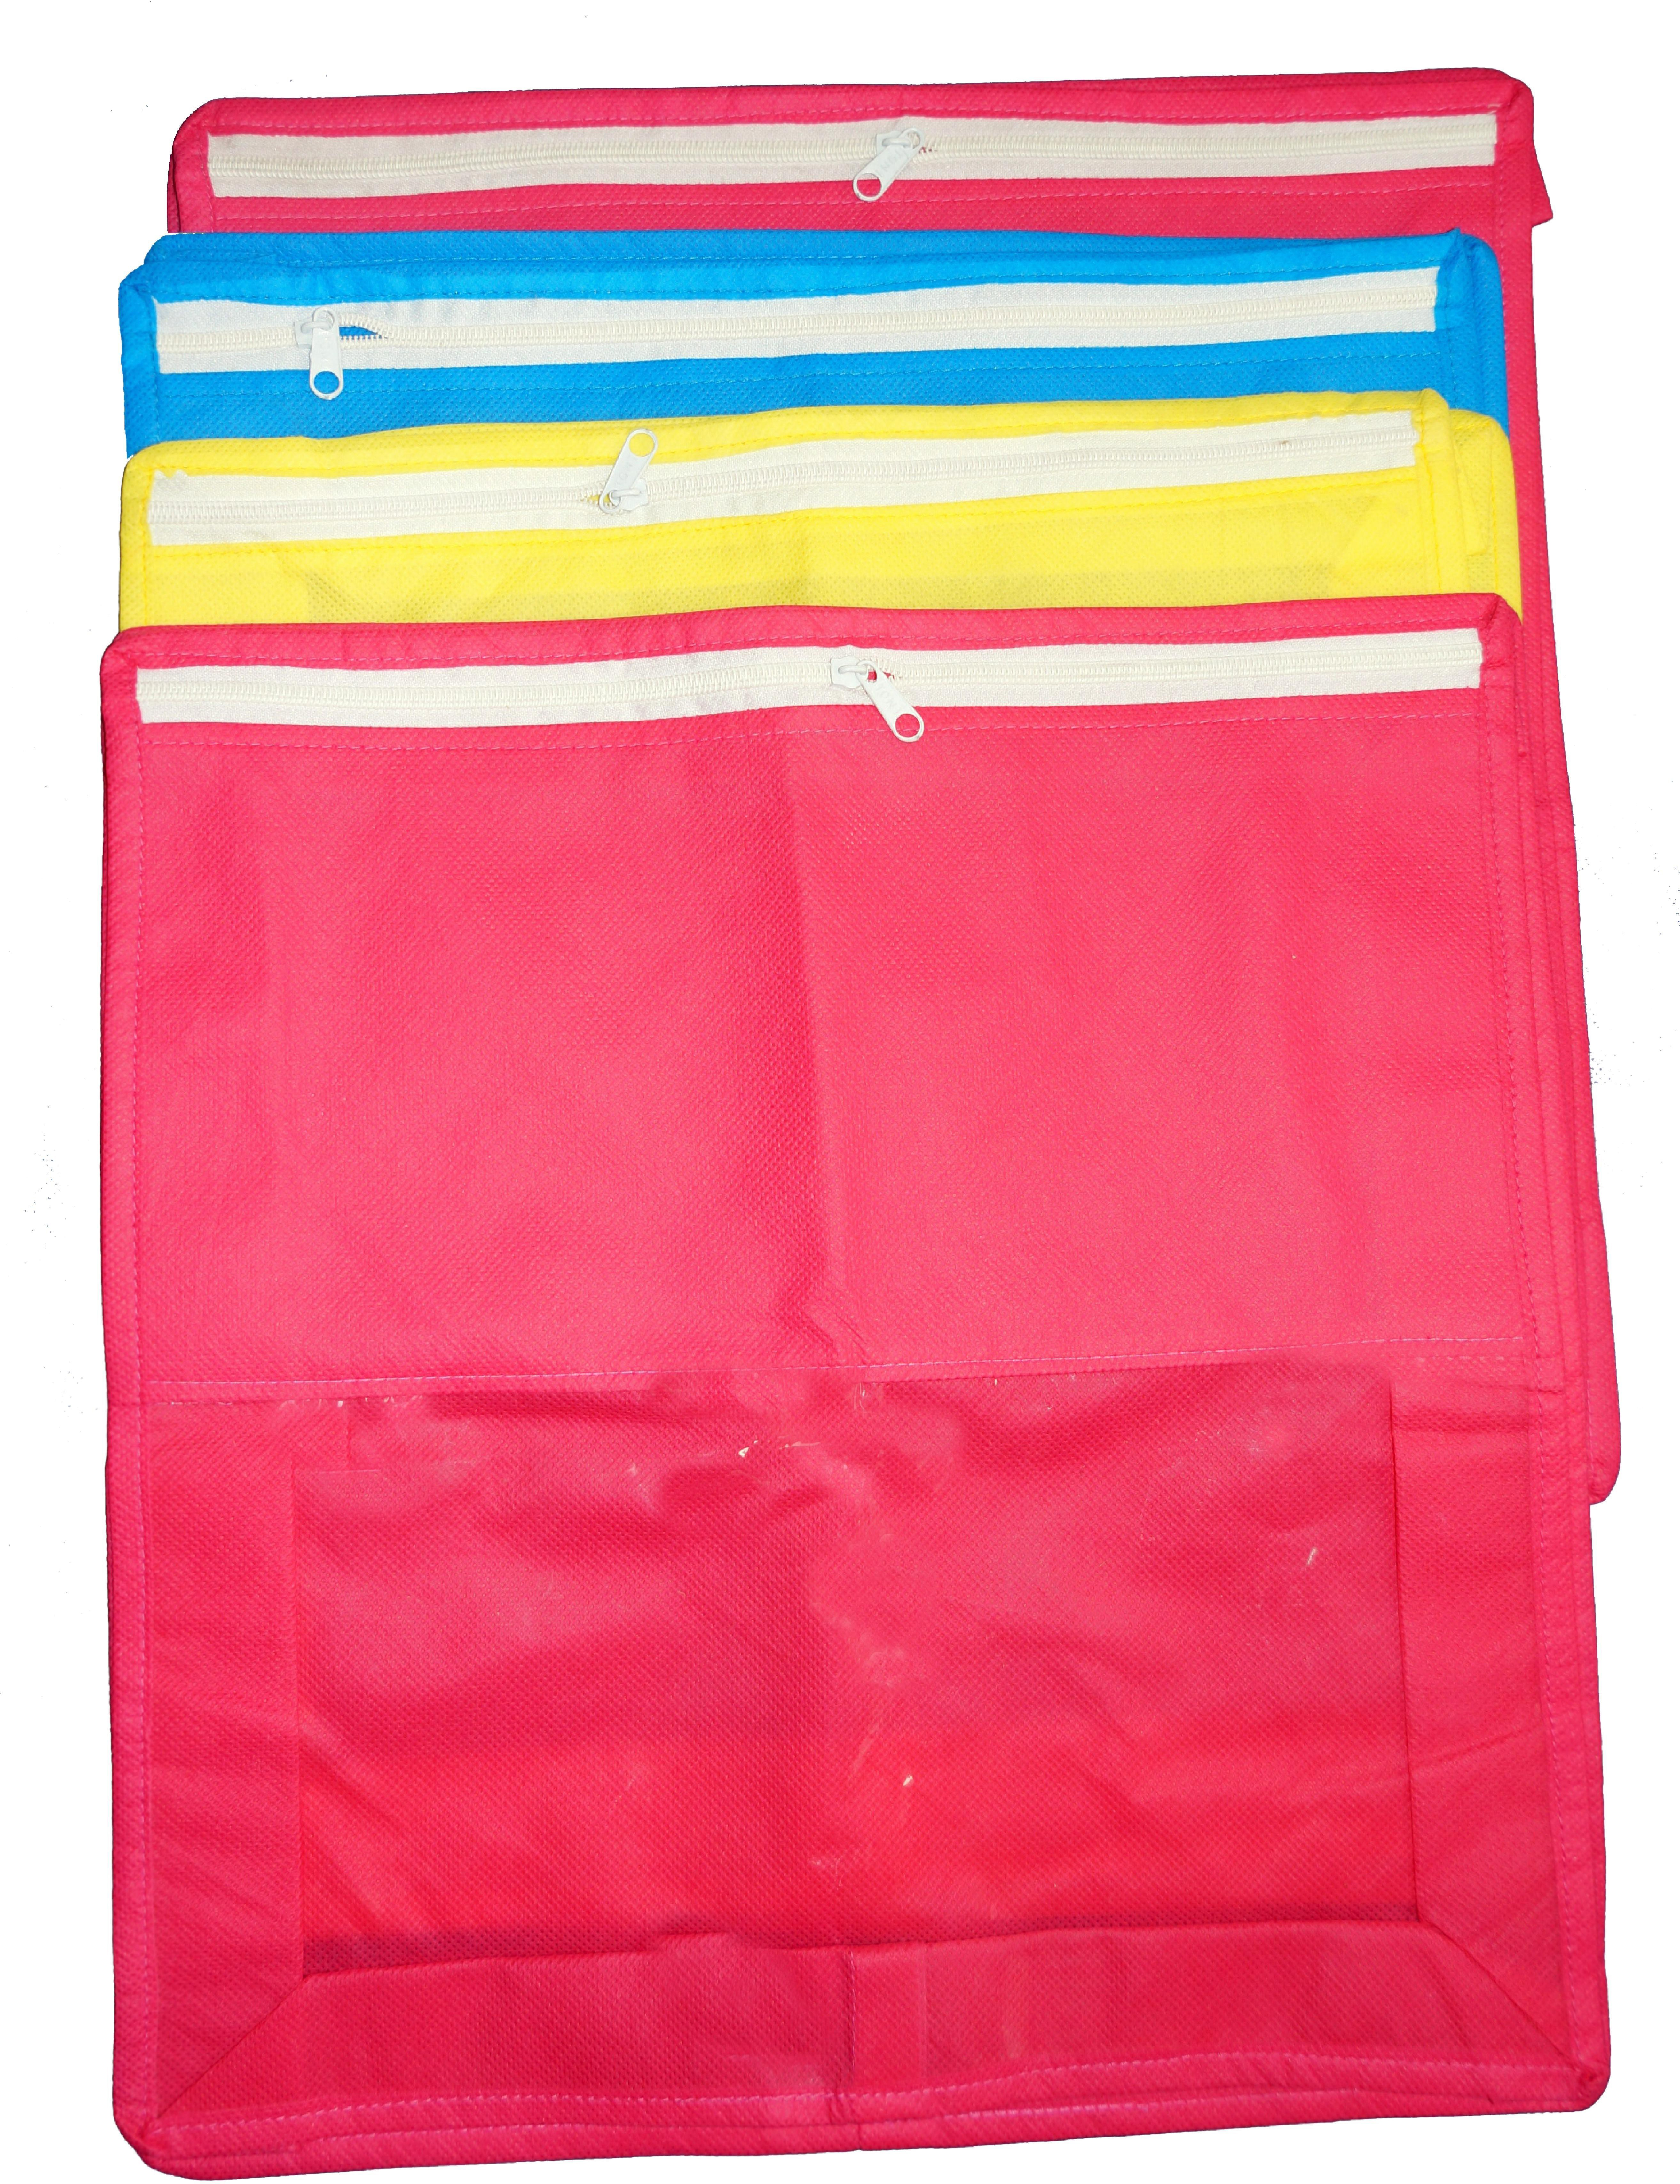 de10ada287f3 Greatech Designer Greatech Saree Cover Combo4(Pink